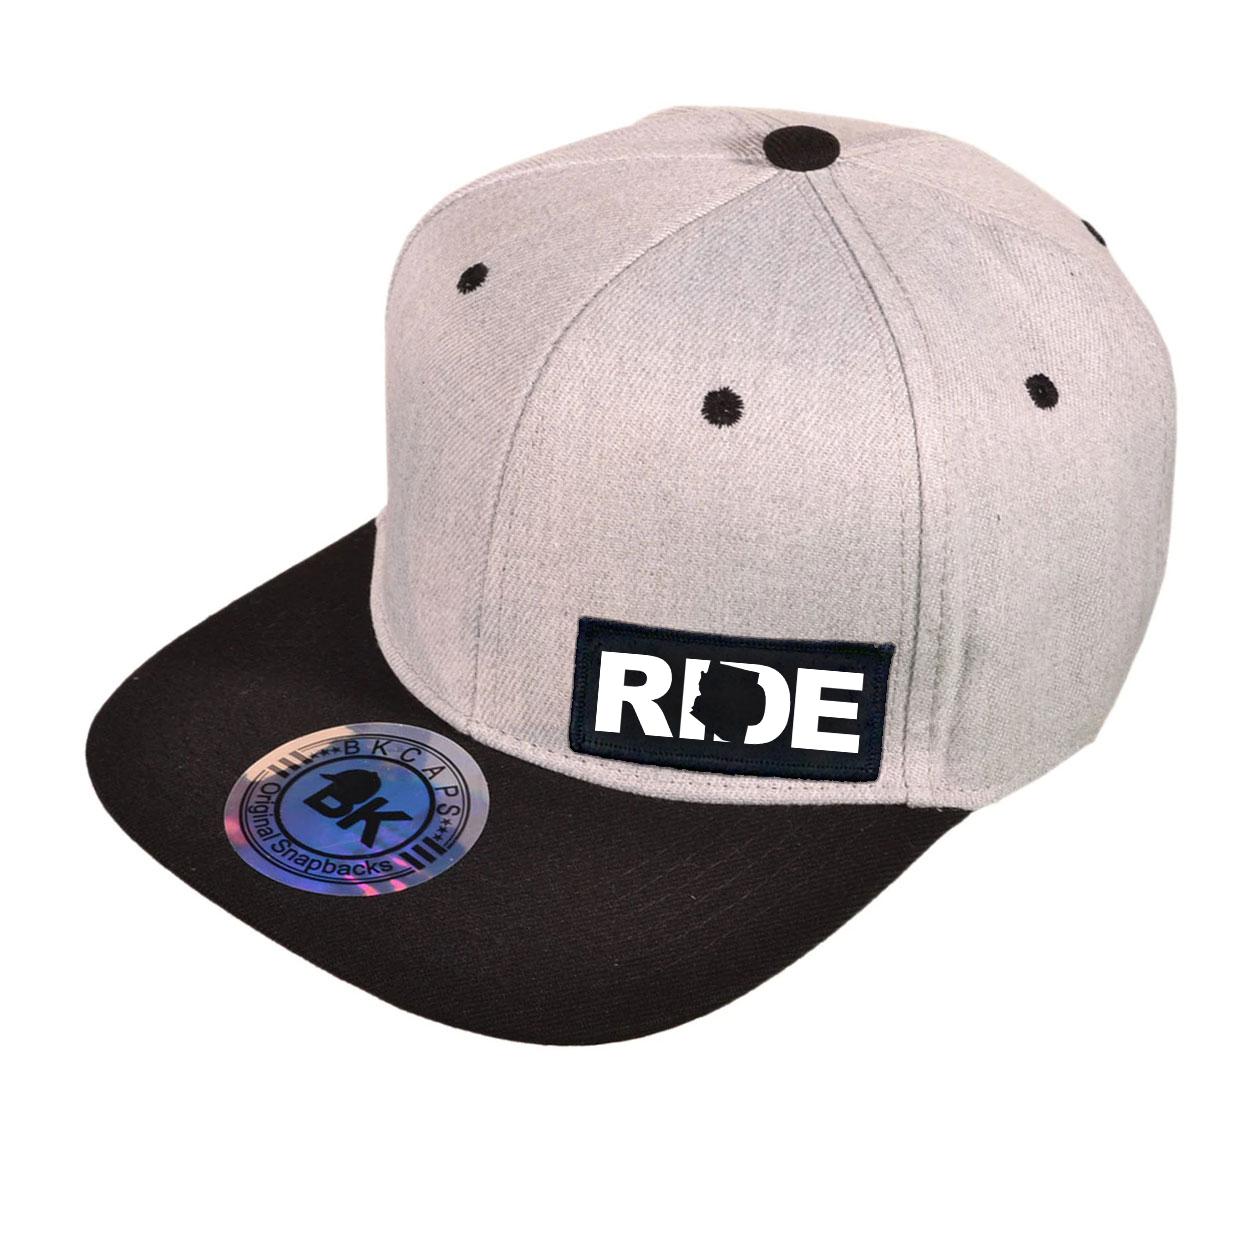 Ride Arizona Night Out Woven Patch Snapback Flat Brim Hat Heather Gray/Black (White Logo)